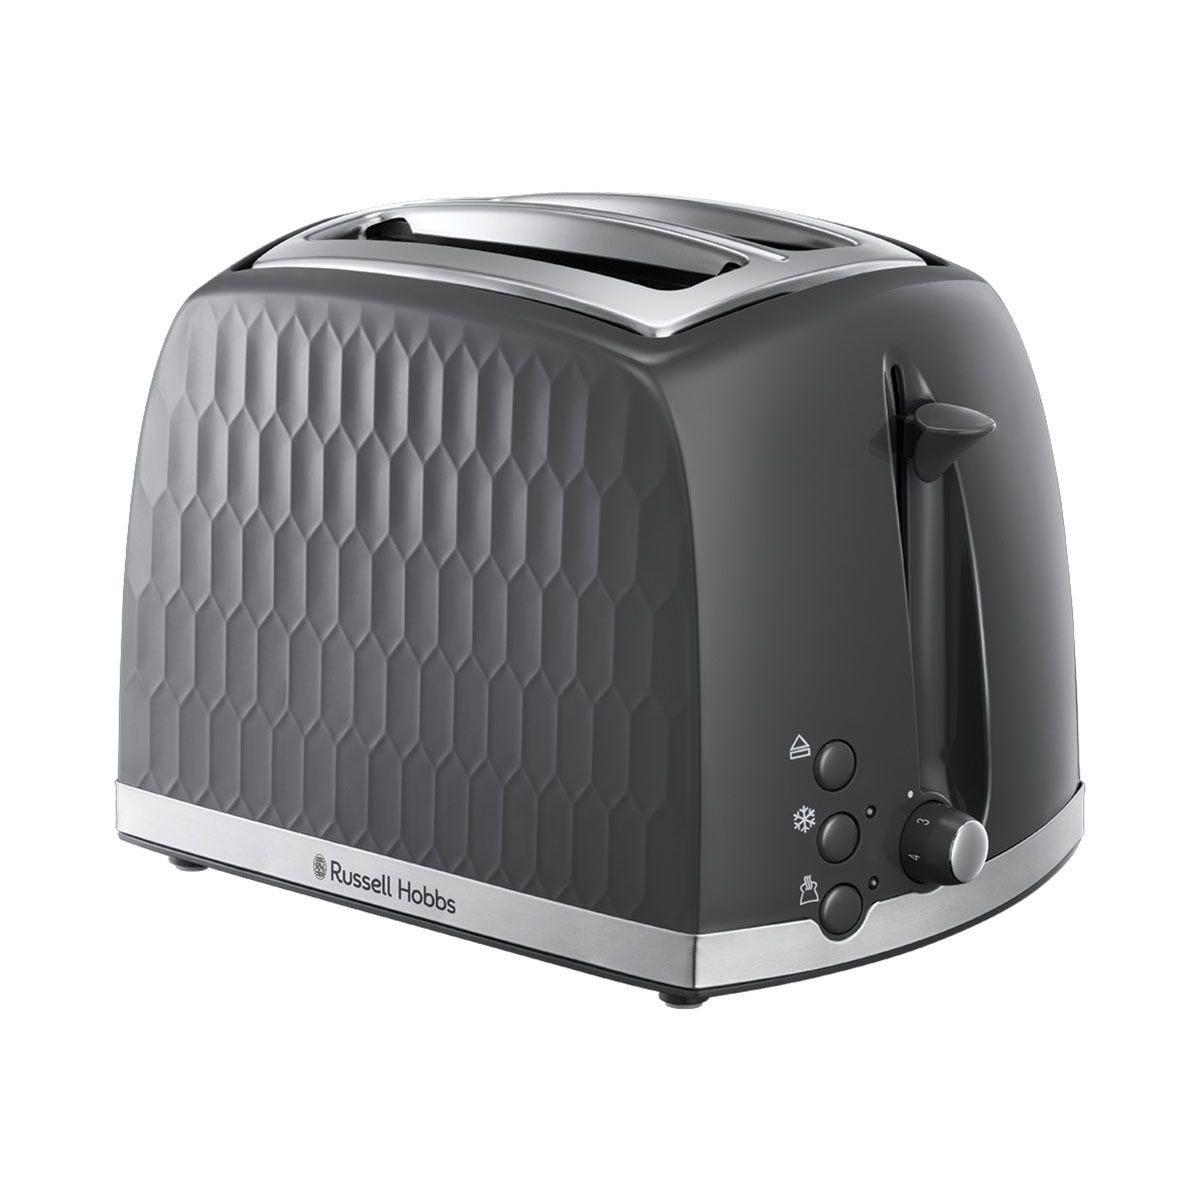 Russell Hobbs 26063 Honeycomb Textured 850W 2–Slice Toaster – Grey